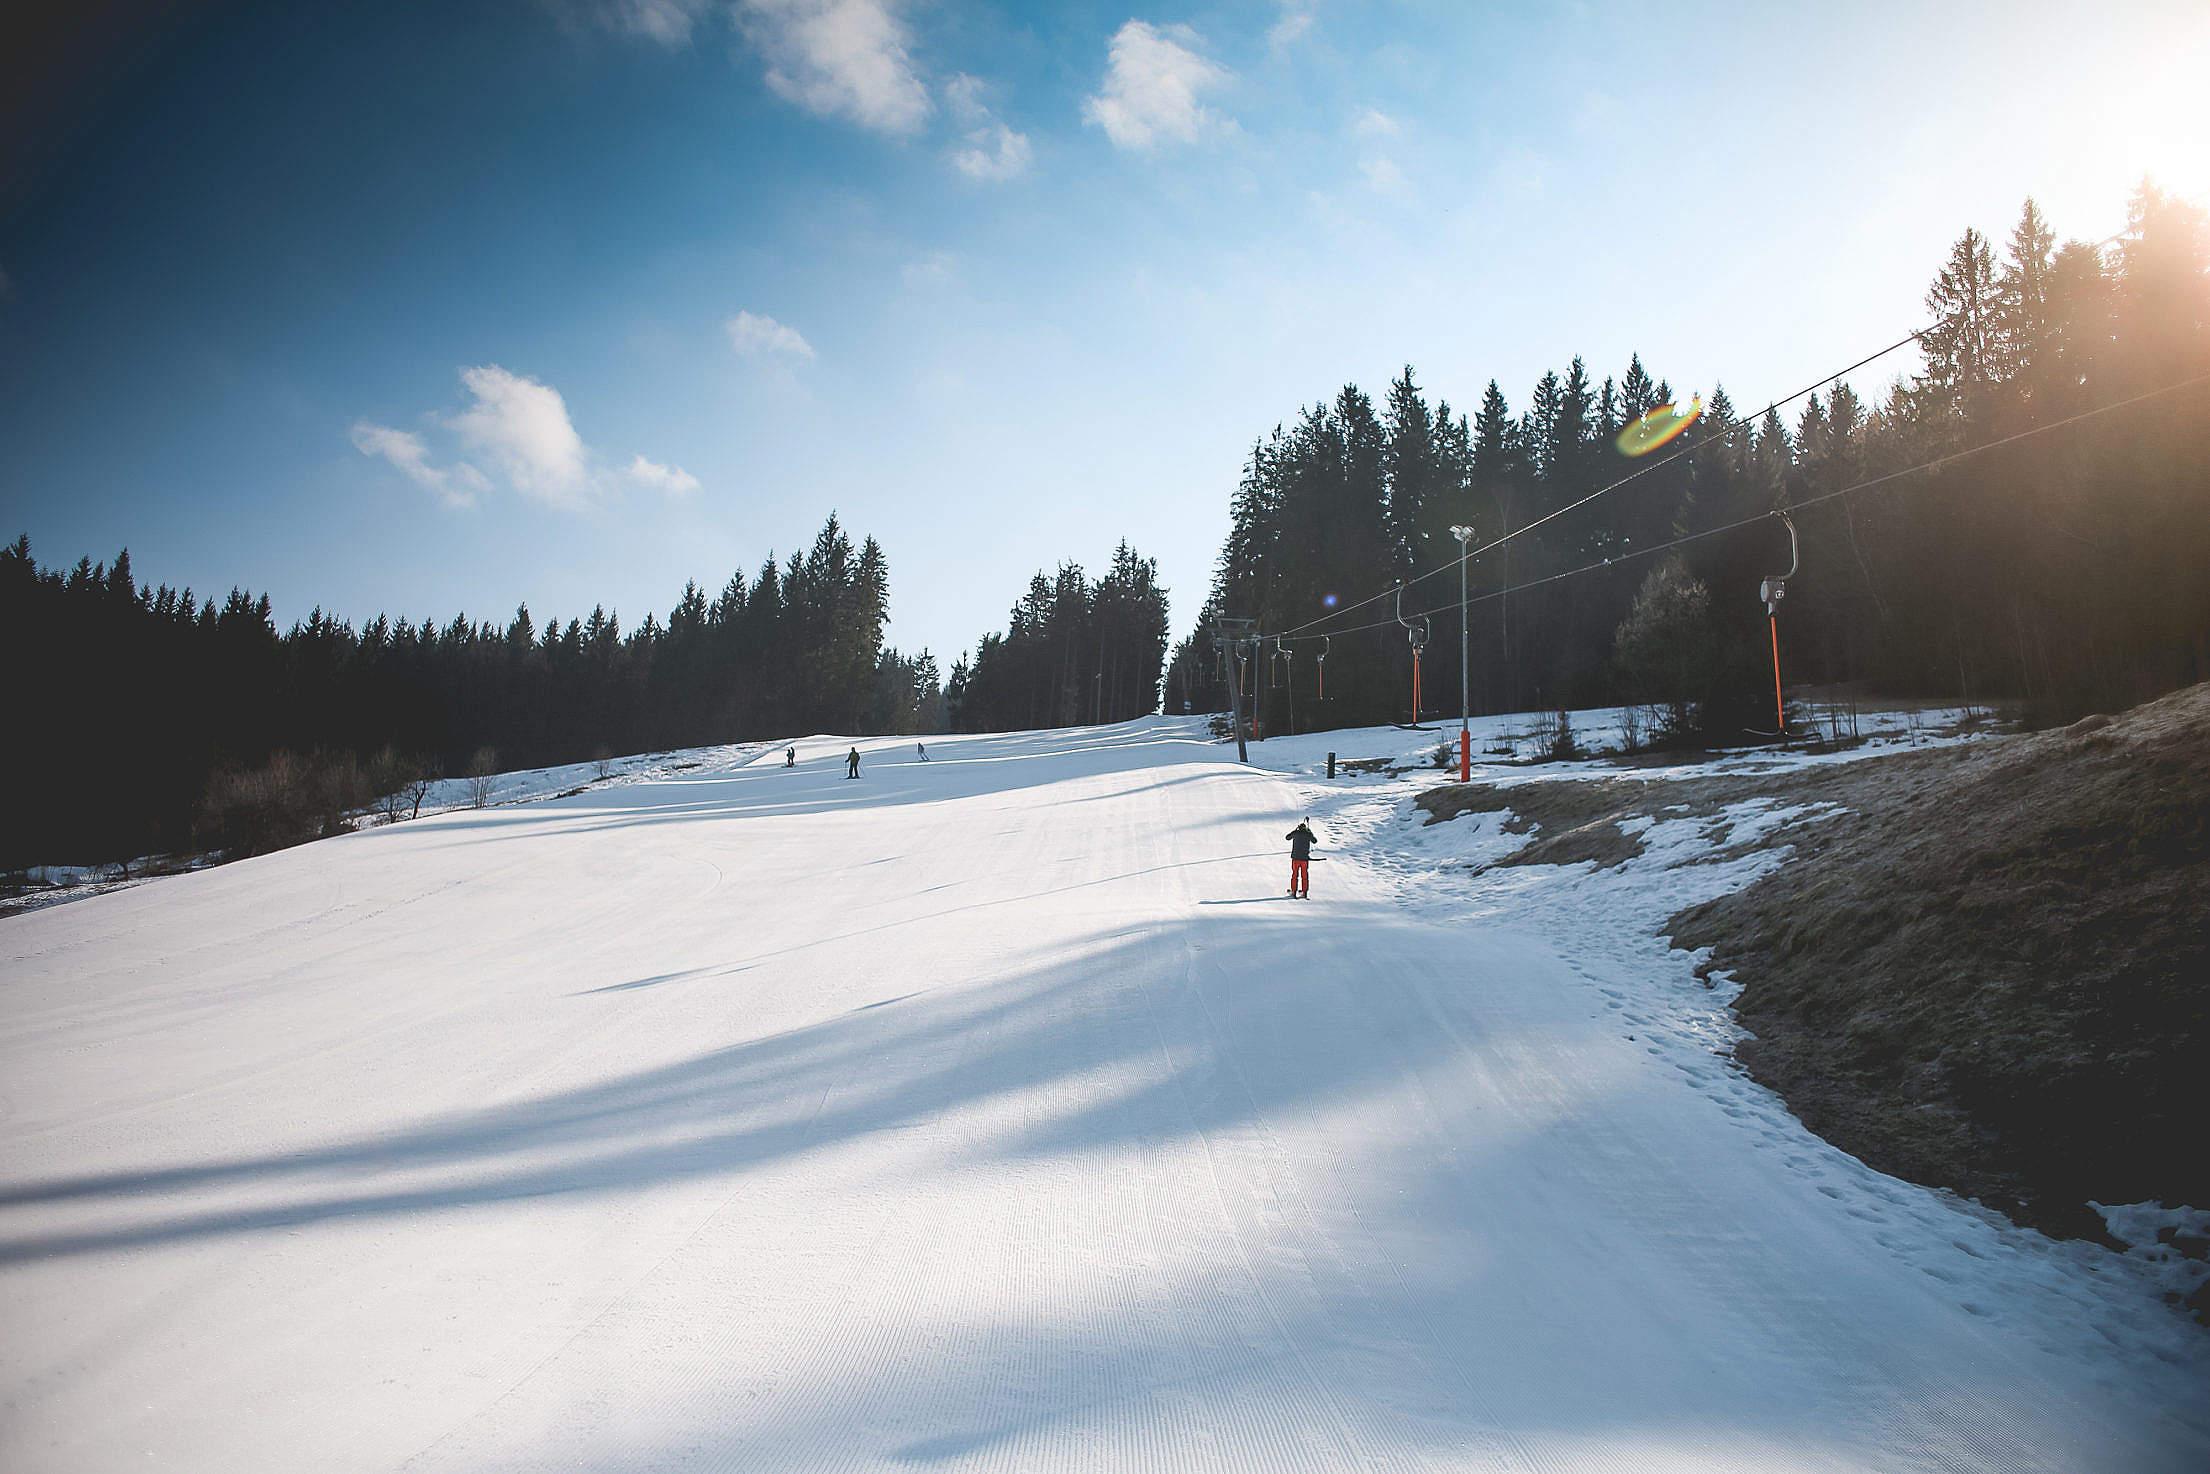 Ski Slope with Sunny Weather Free Stock Photo